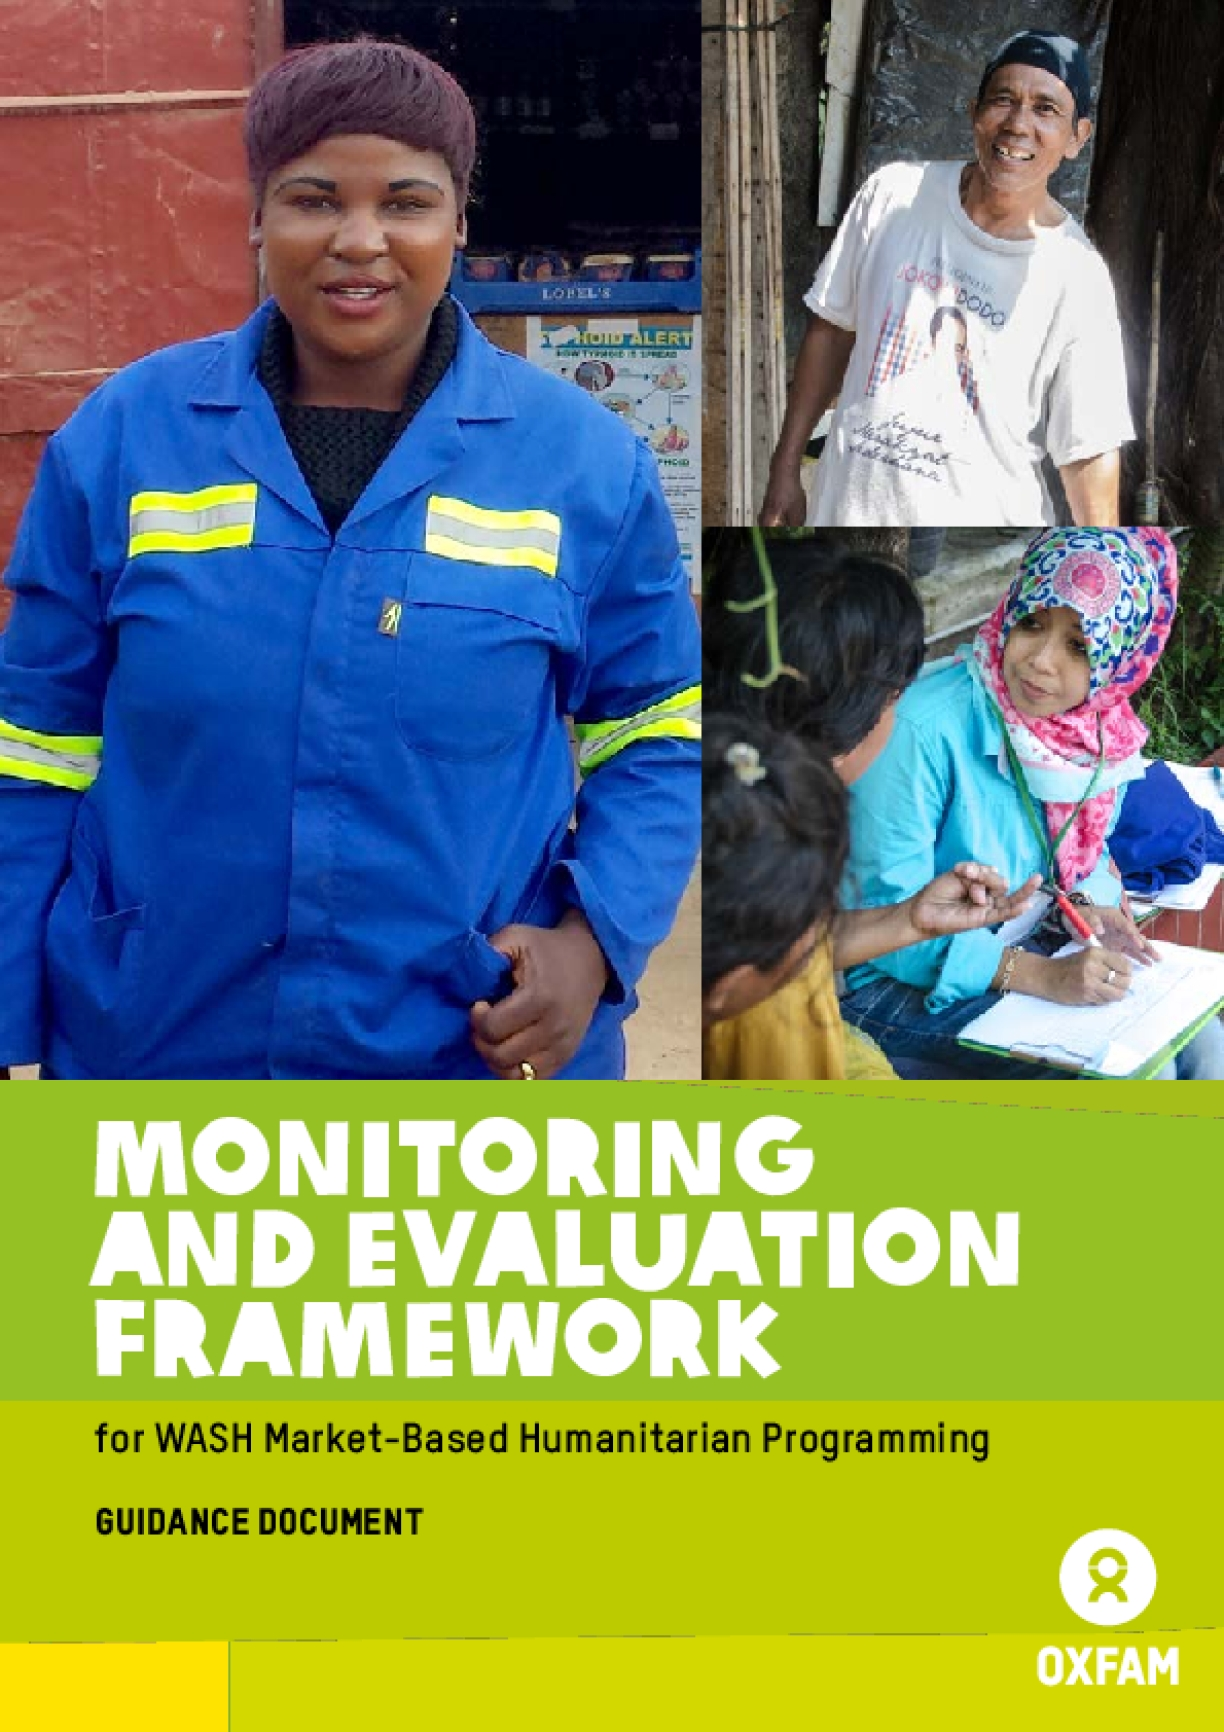 Monitoring and Evaluation Framework for WASH Market-Based Humanitarian Programming